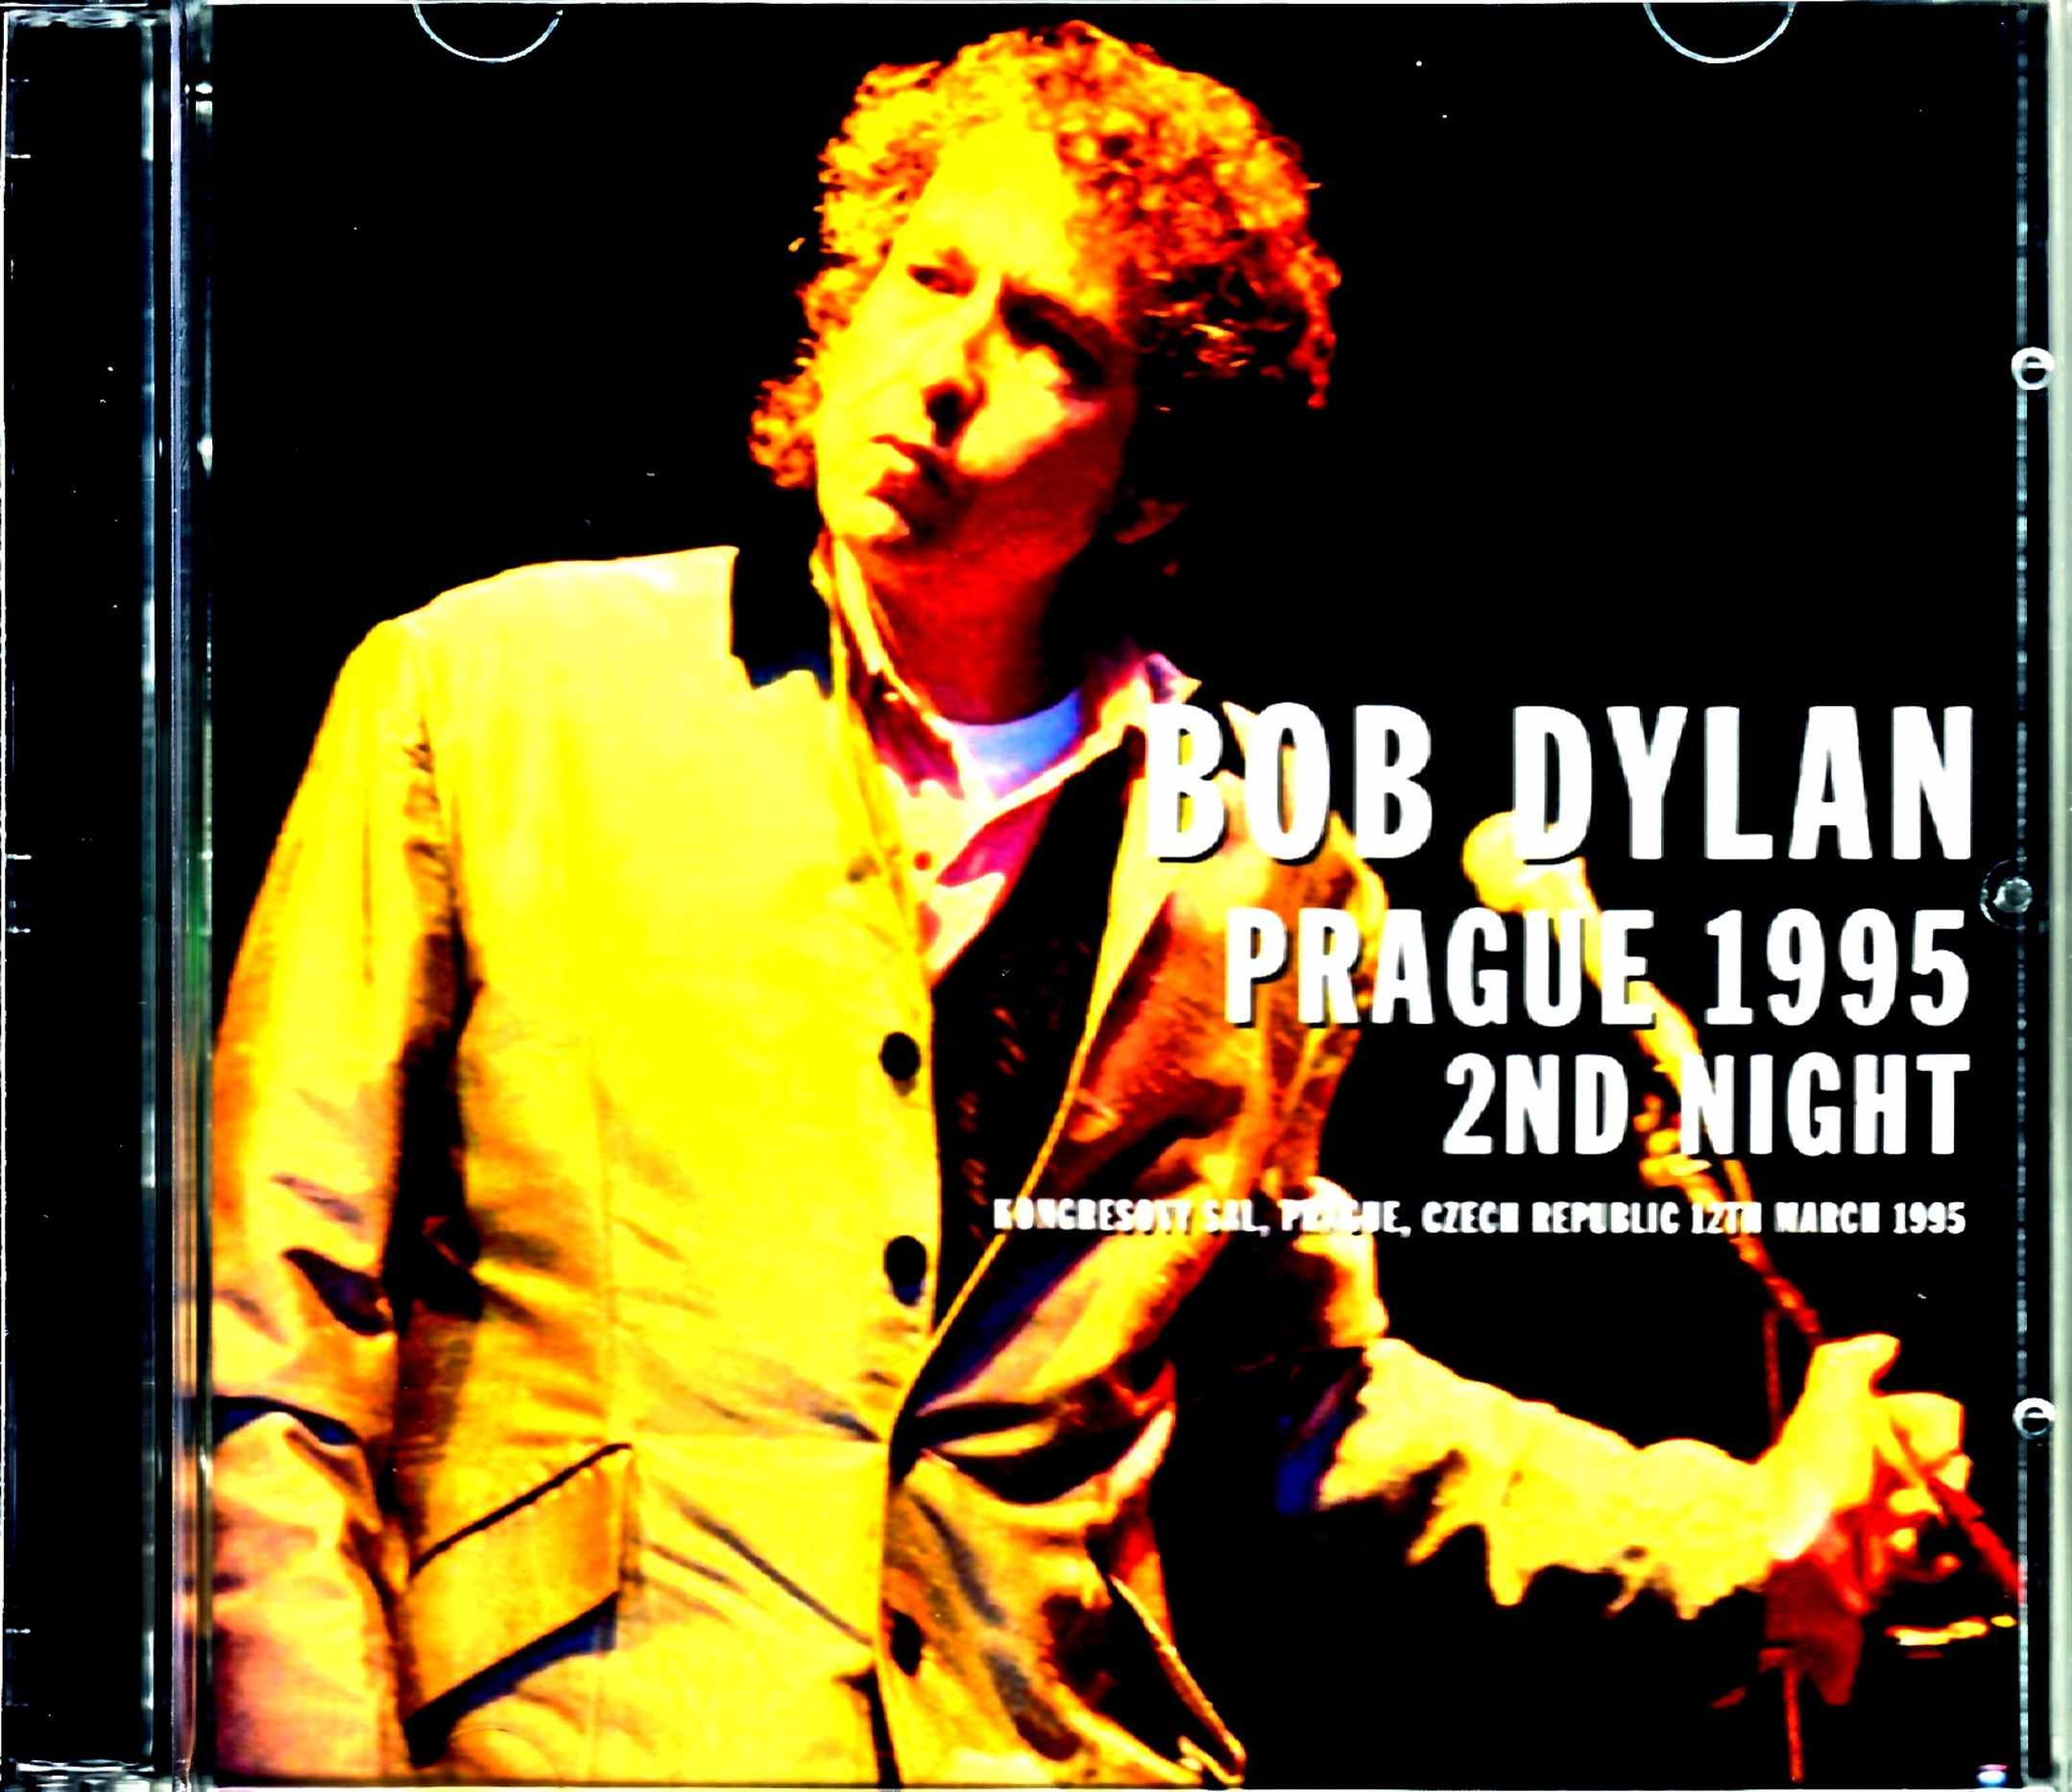 Bob Dylan ボブ・ディラン/Czech Republic 3.12.1995